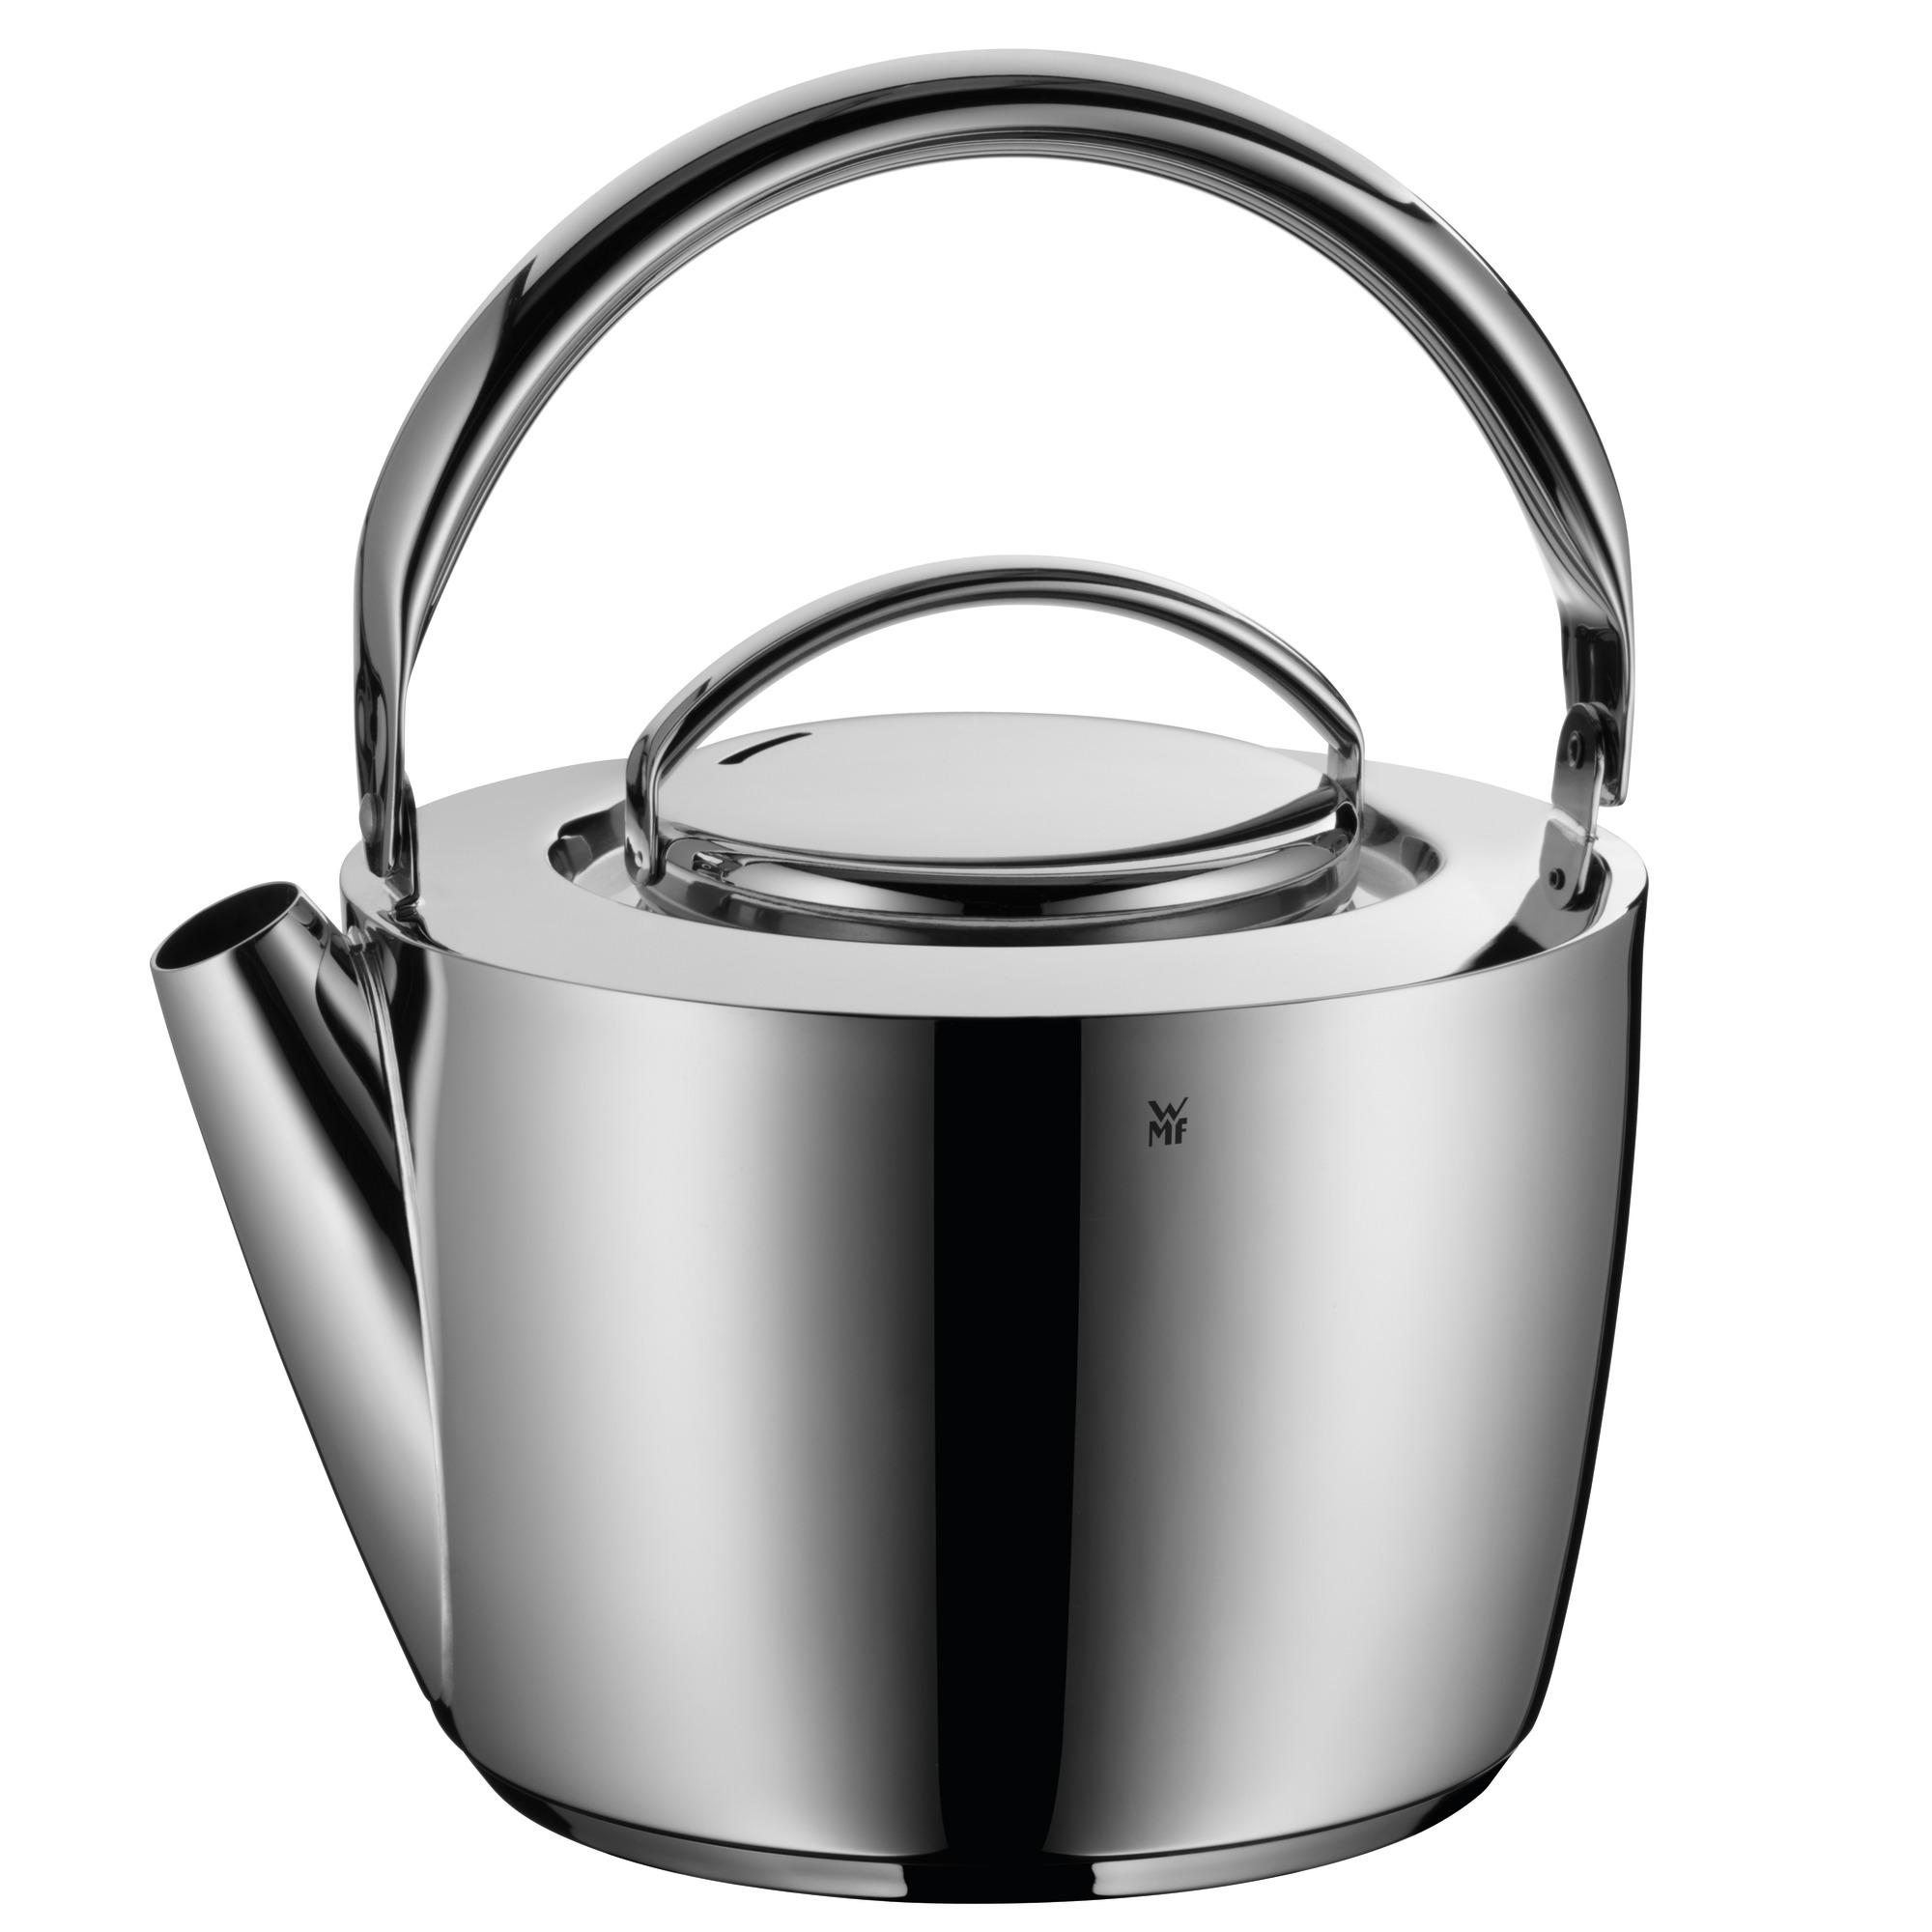 Kitchenaid Wasserkessel kitchenaid wasserkessel hausdesign pro